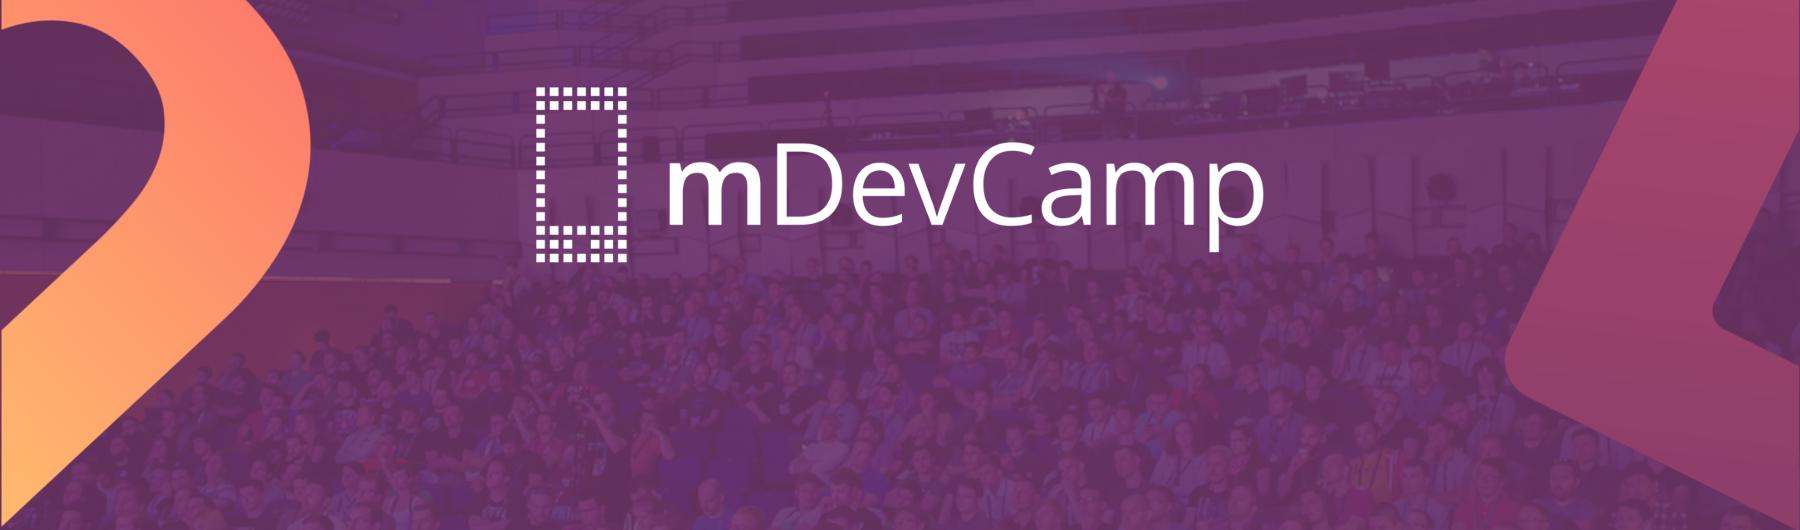 mDevCamp 2019